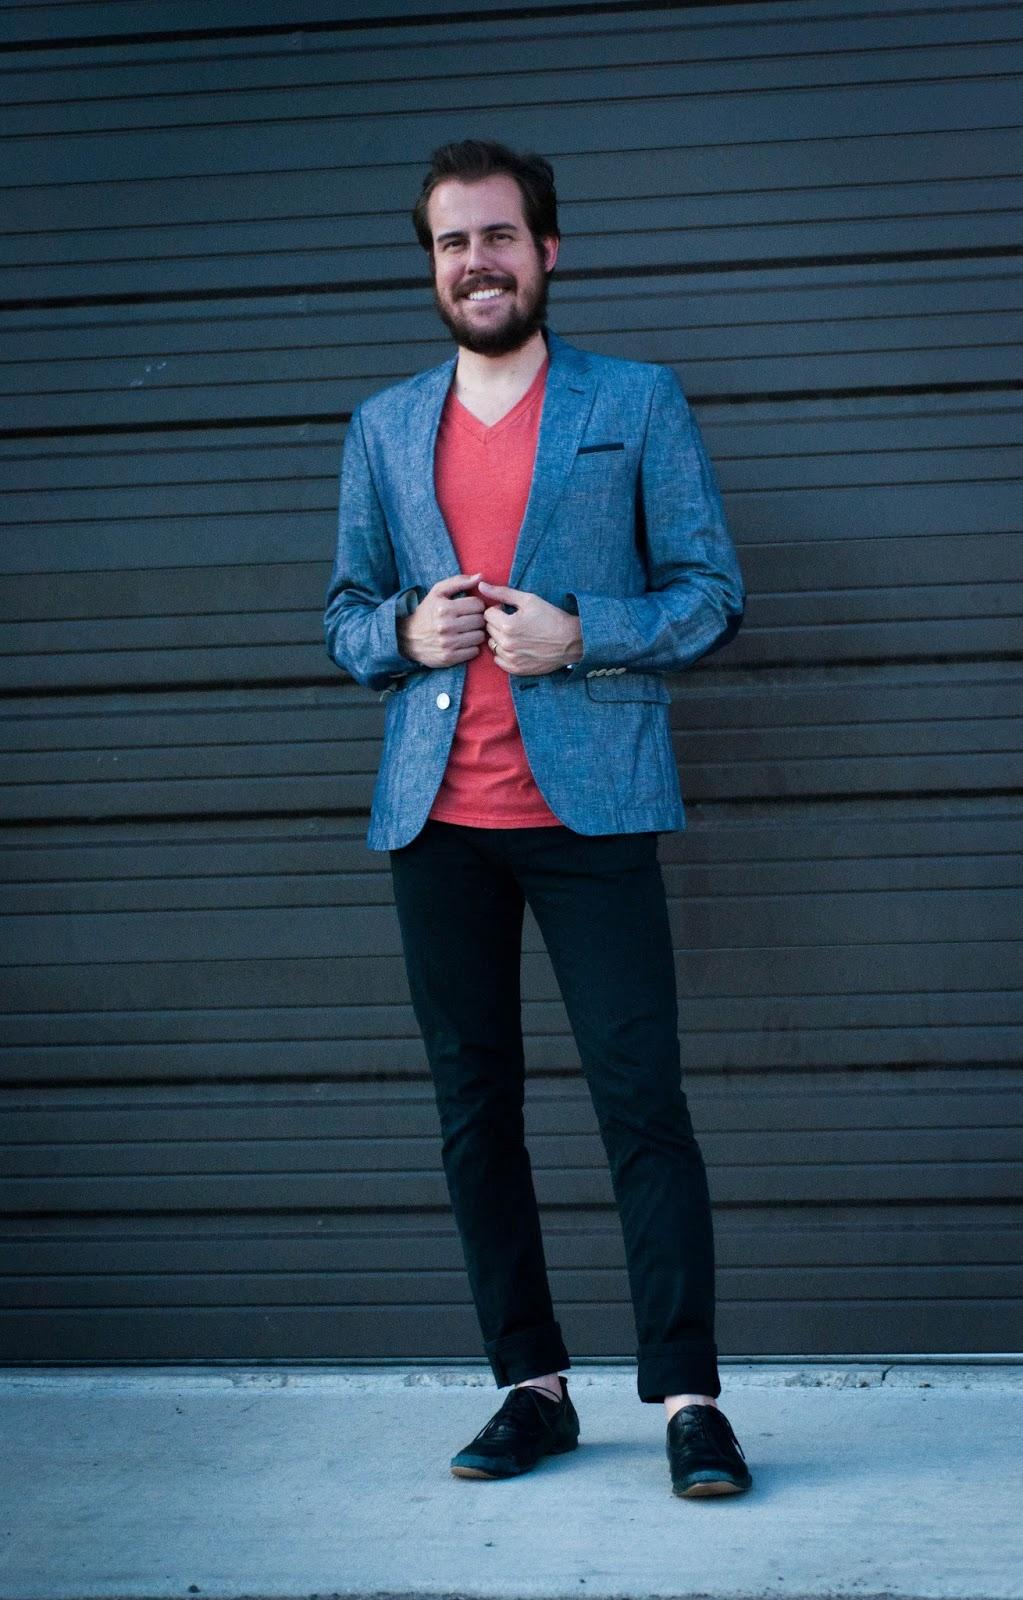 ootd, levis 511, zara blazer, urban outfitters mens wear, mens style blog, mens fashion blog